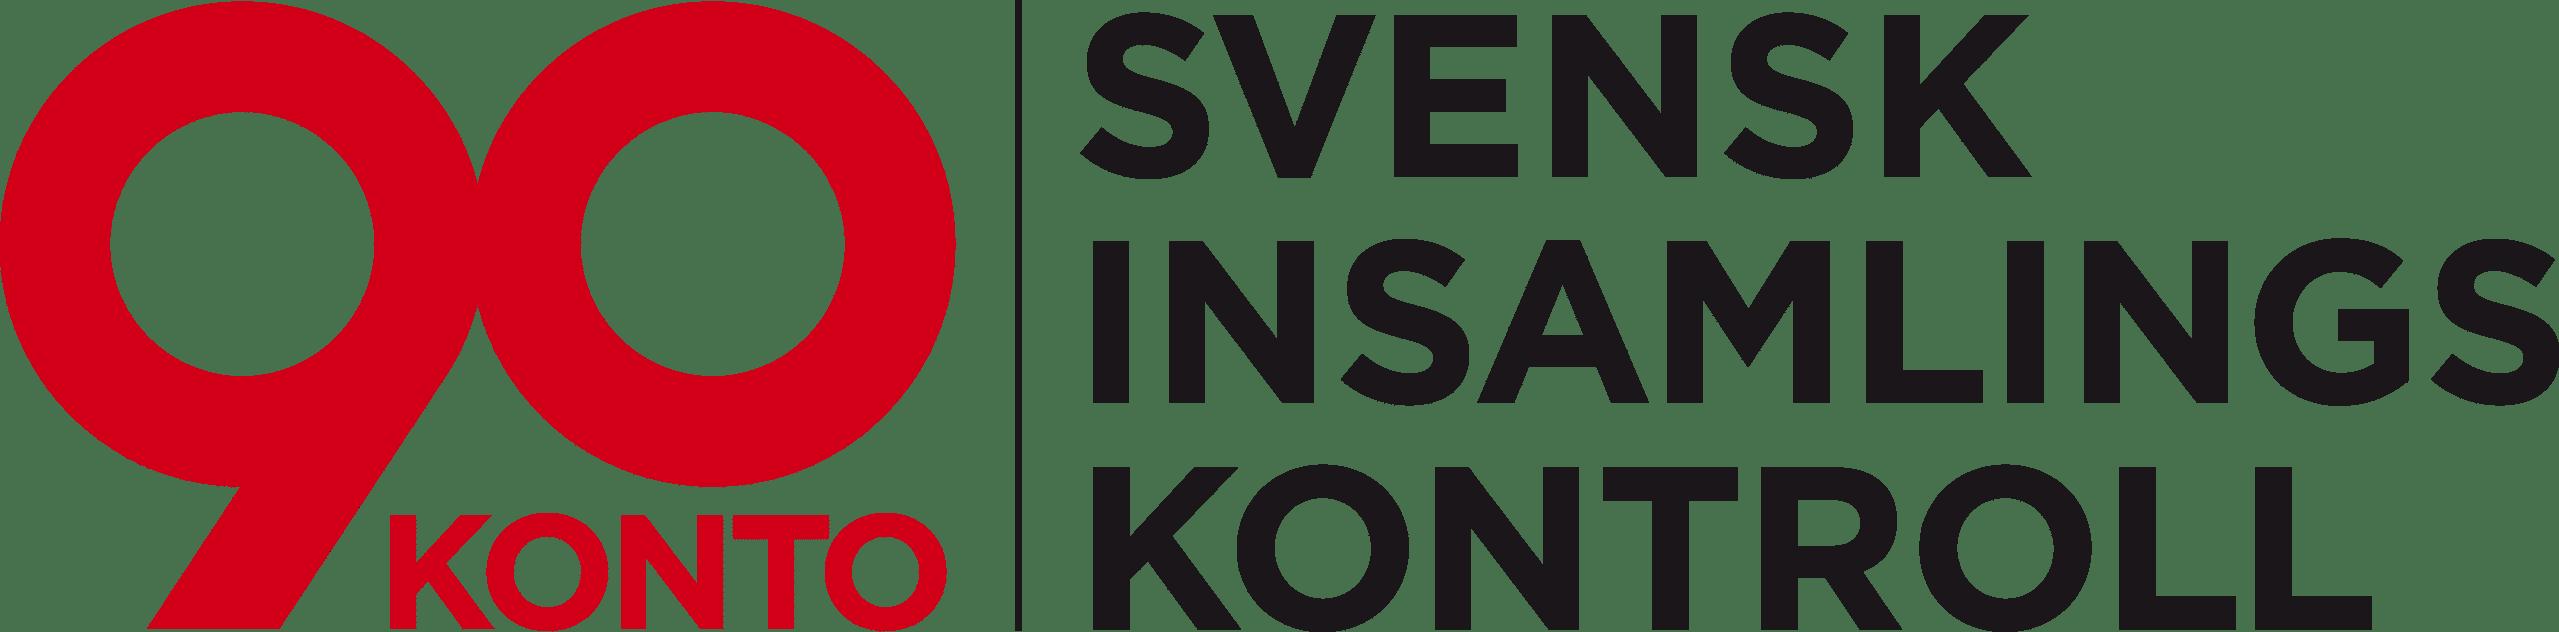 90-konto Svensk insalmlingskontroll